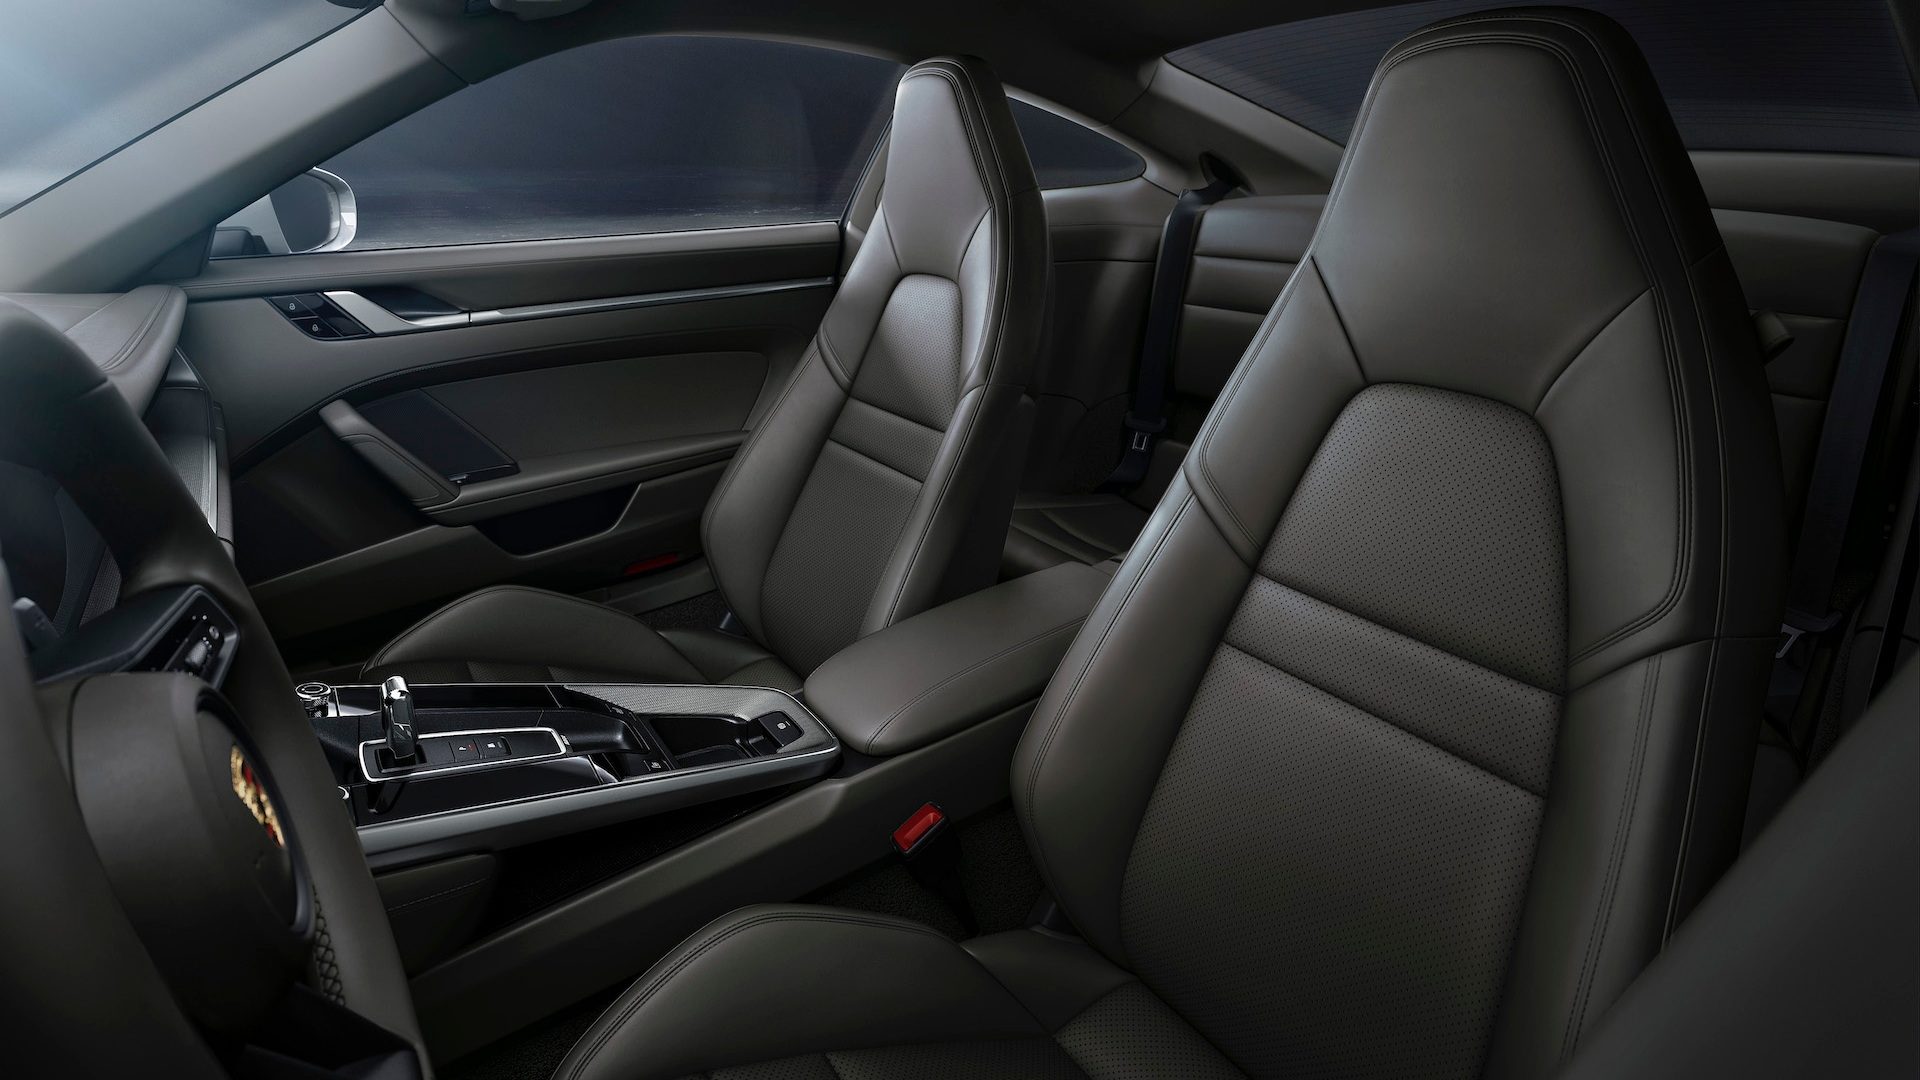 Porsche unveils all-wheel drive 2020 911 Carrera 4 Coupe, Cabriolet